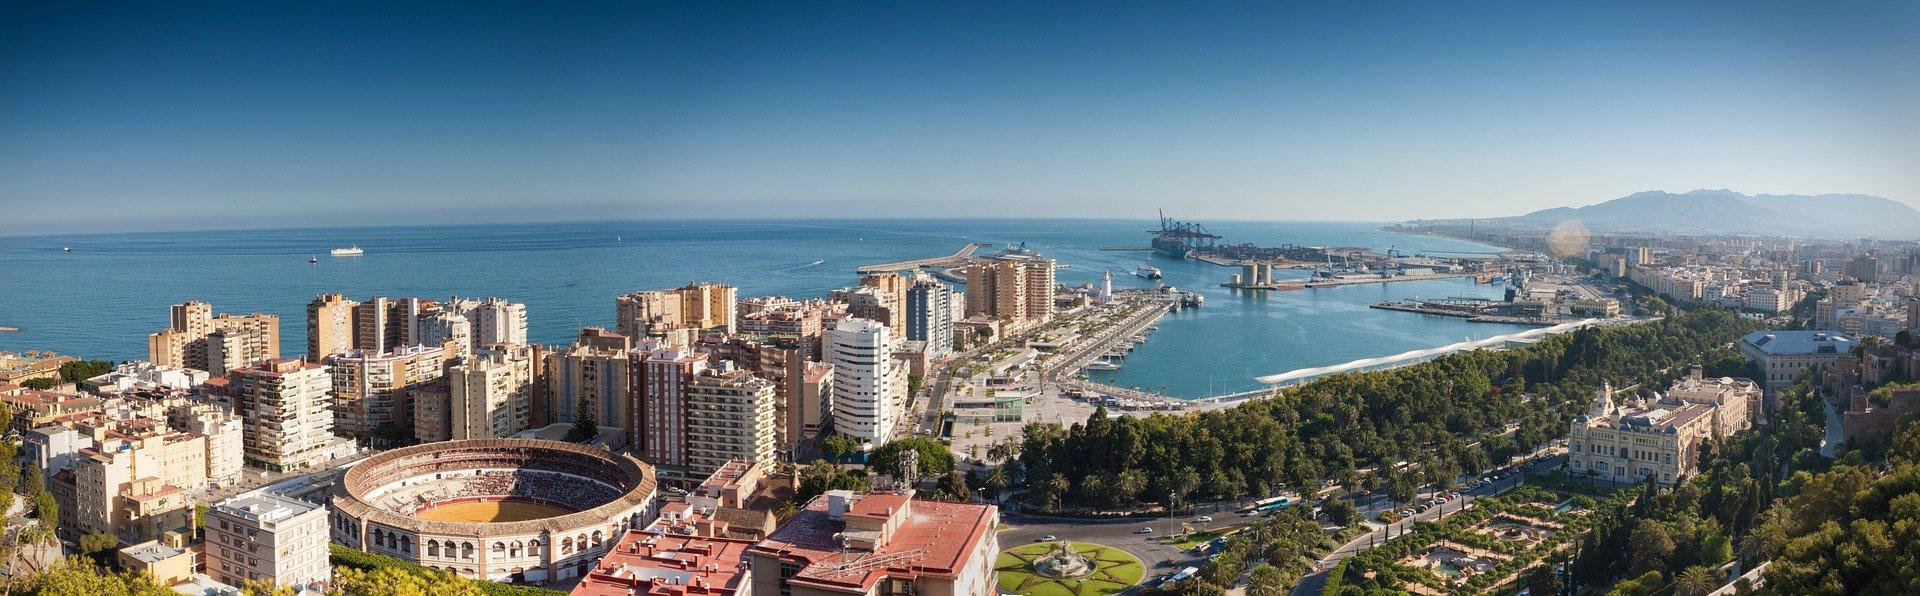 Malaga_spain_sea_and_port_view